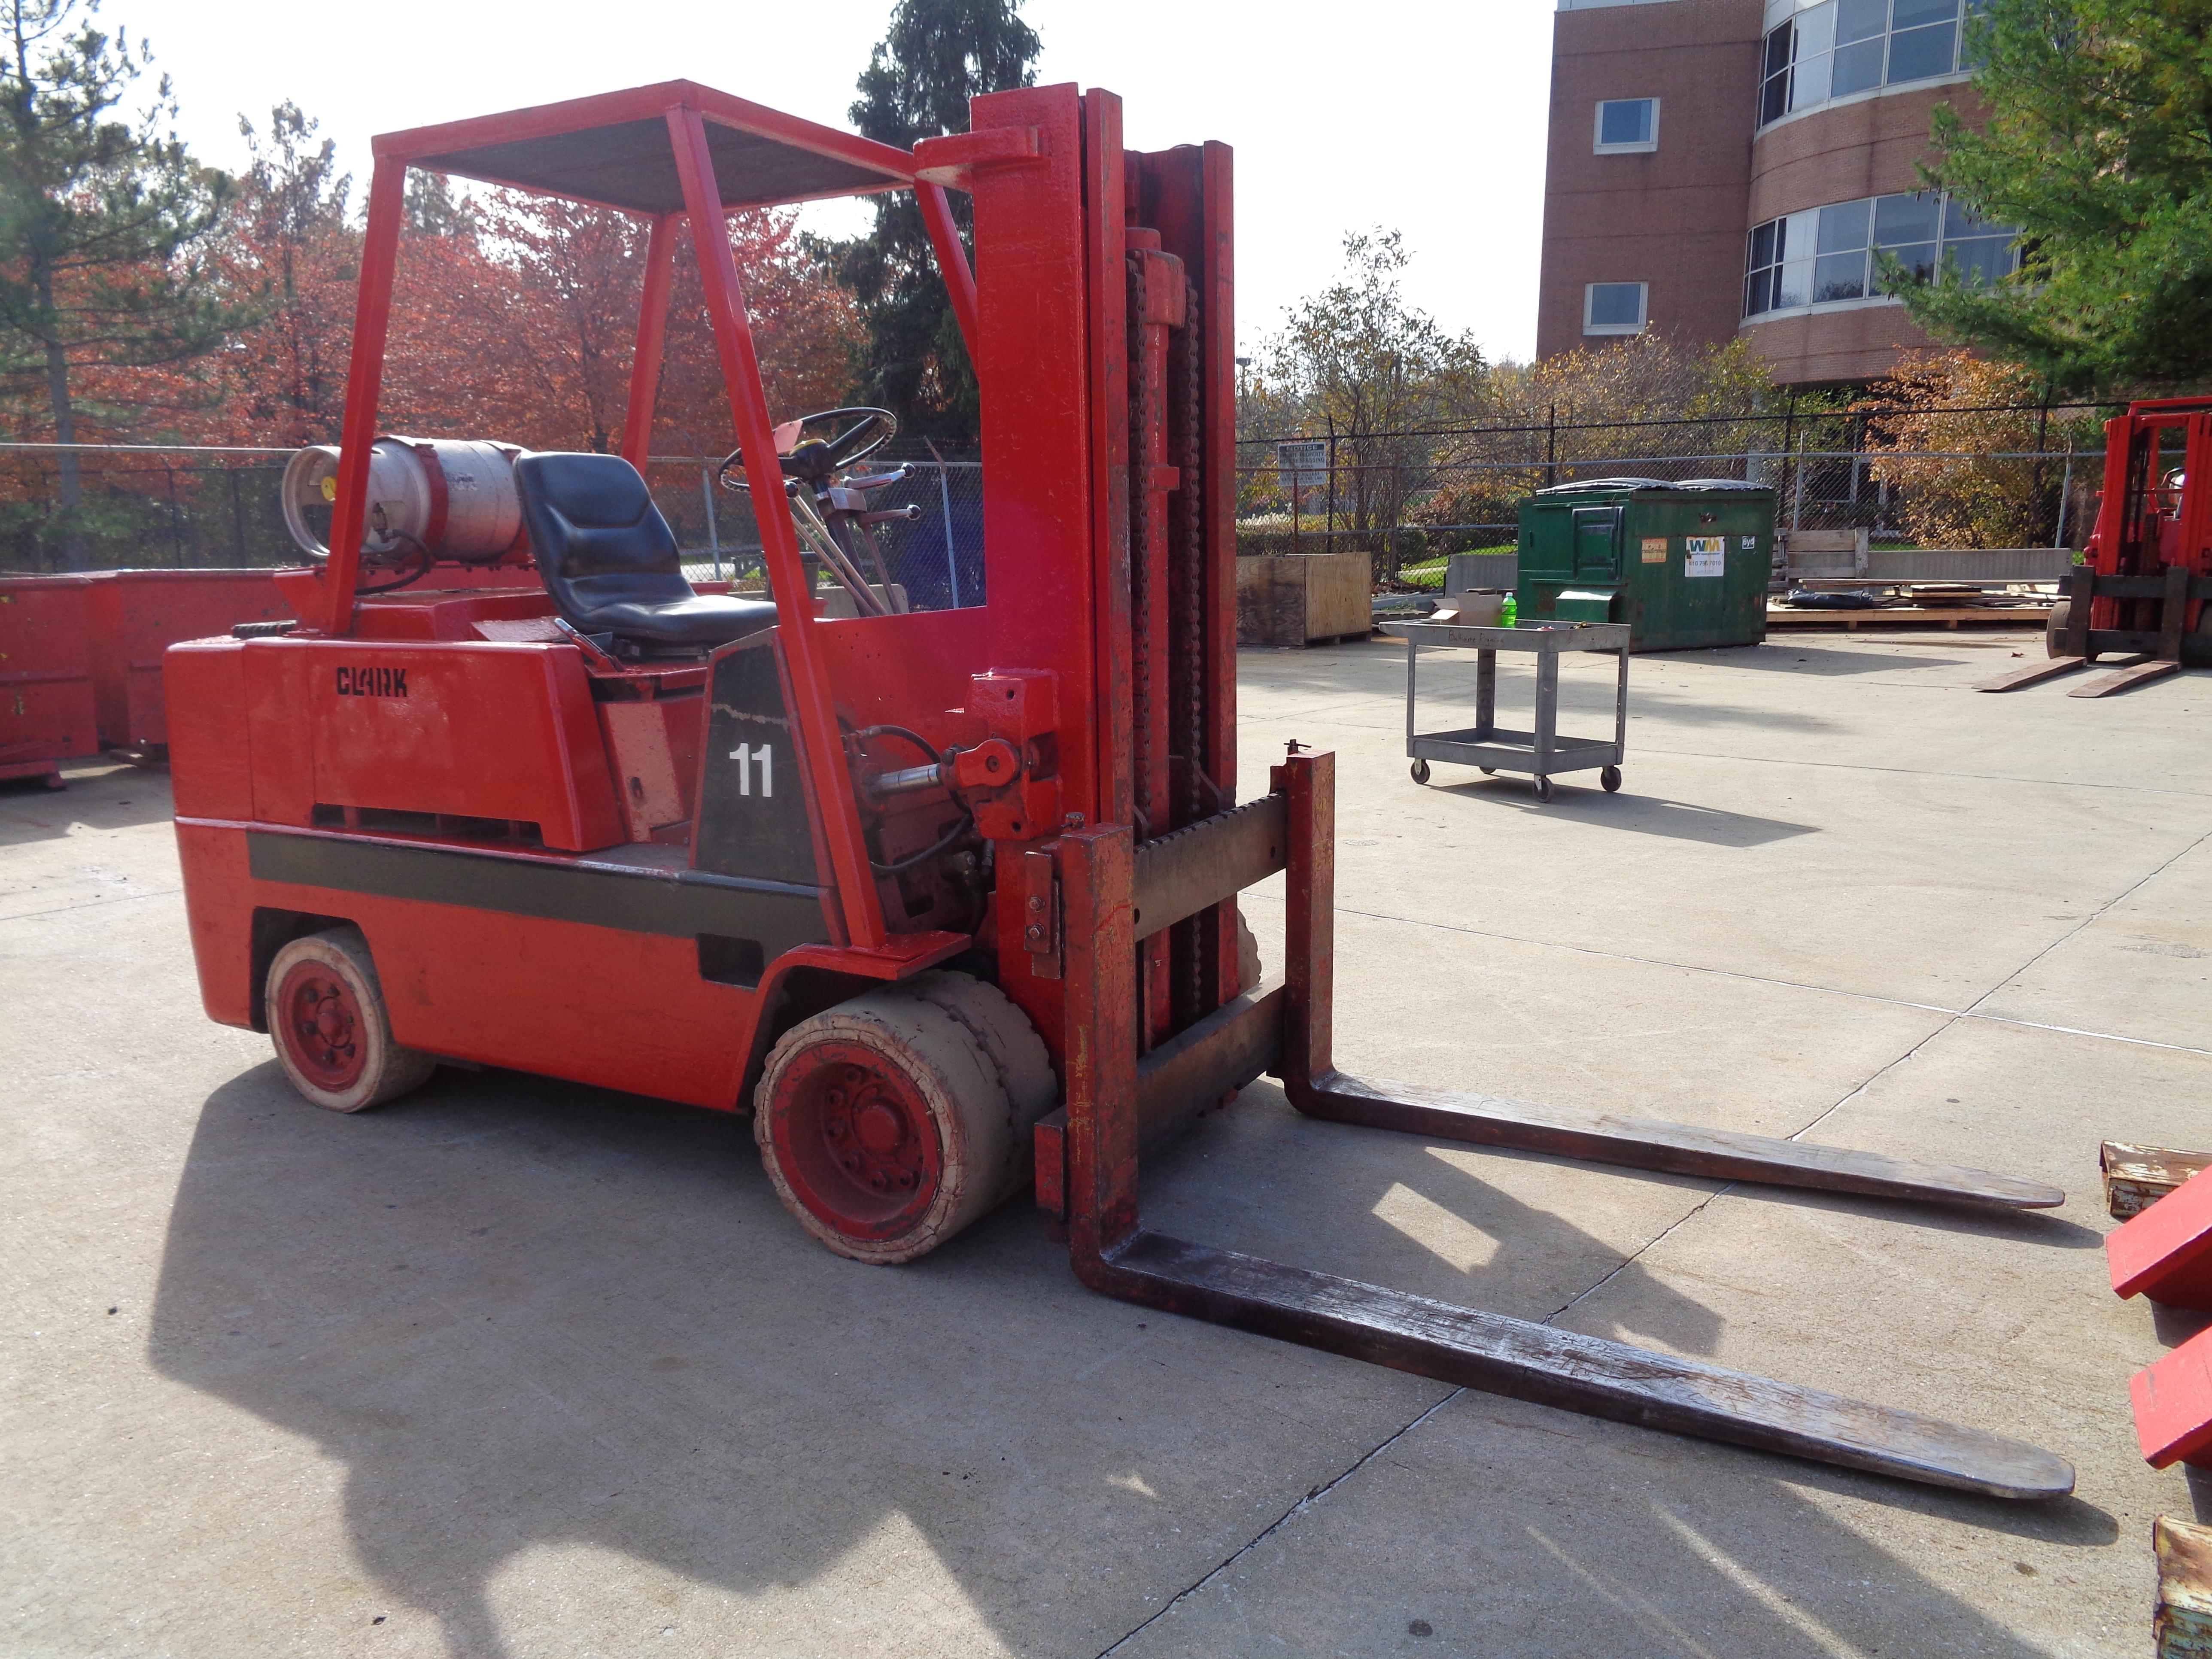 Clark C500-120 Forklift plus boom - 12,000 lbs - Image 8 of 11